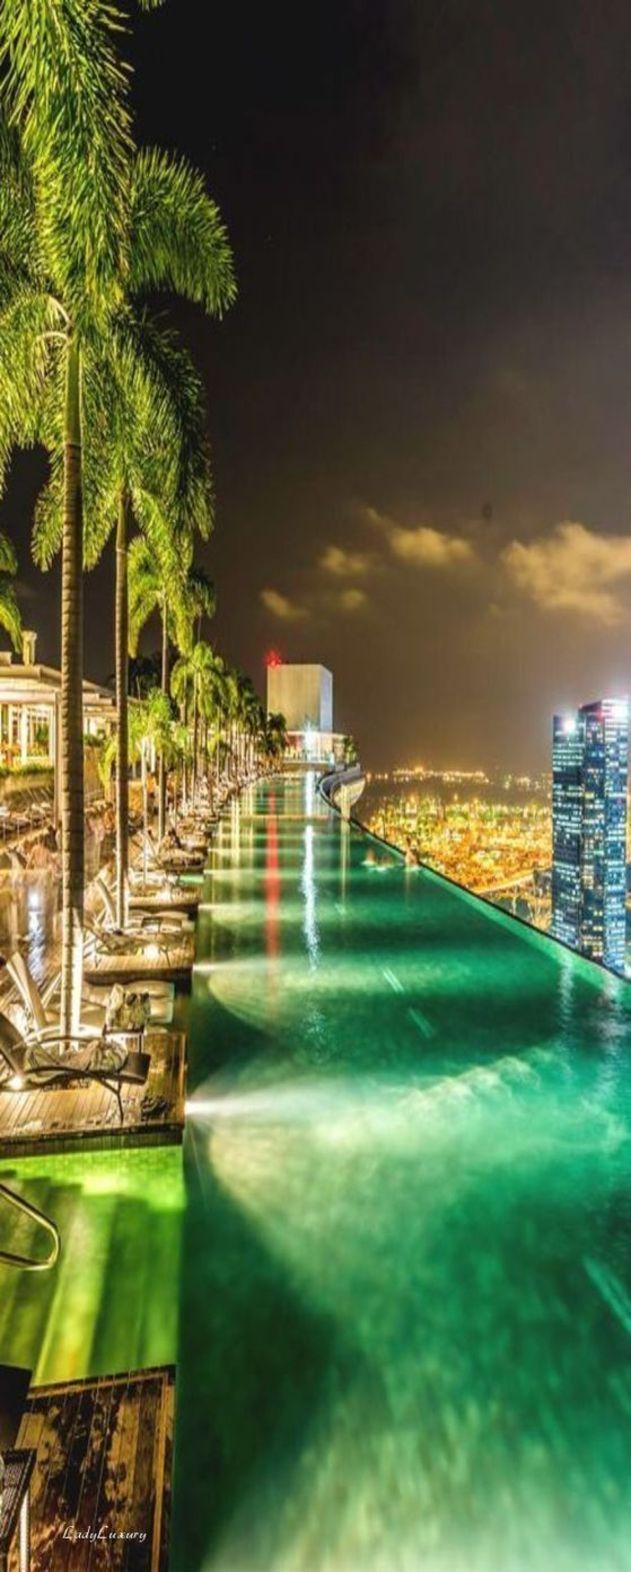 Infinity pool marina bay sands ladyluxurydesigns luxury travelluxury hotelshotels